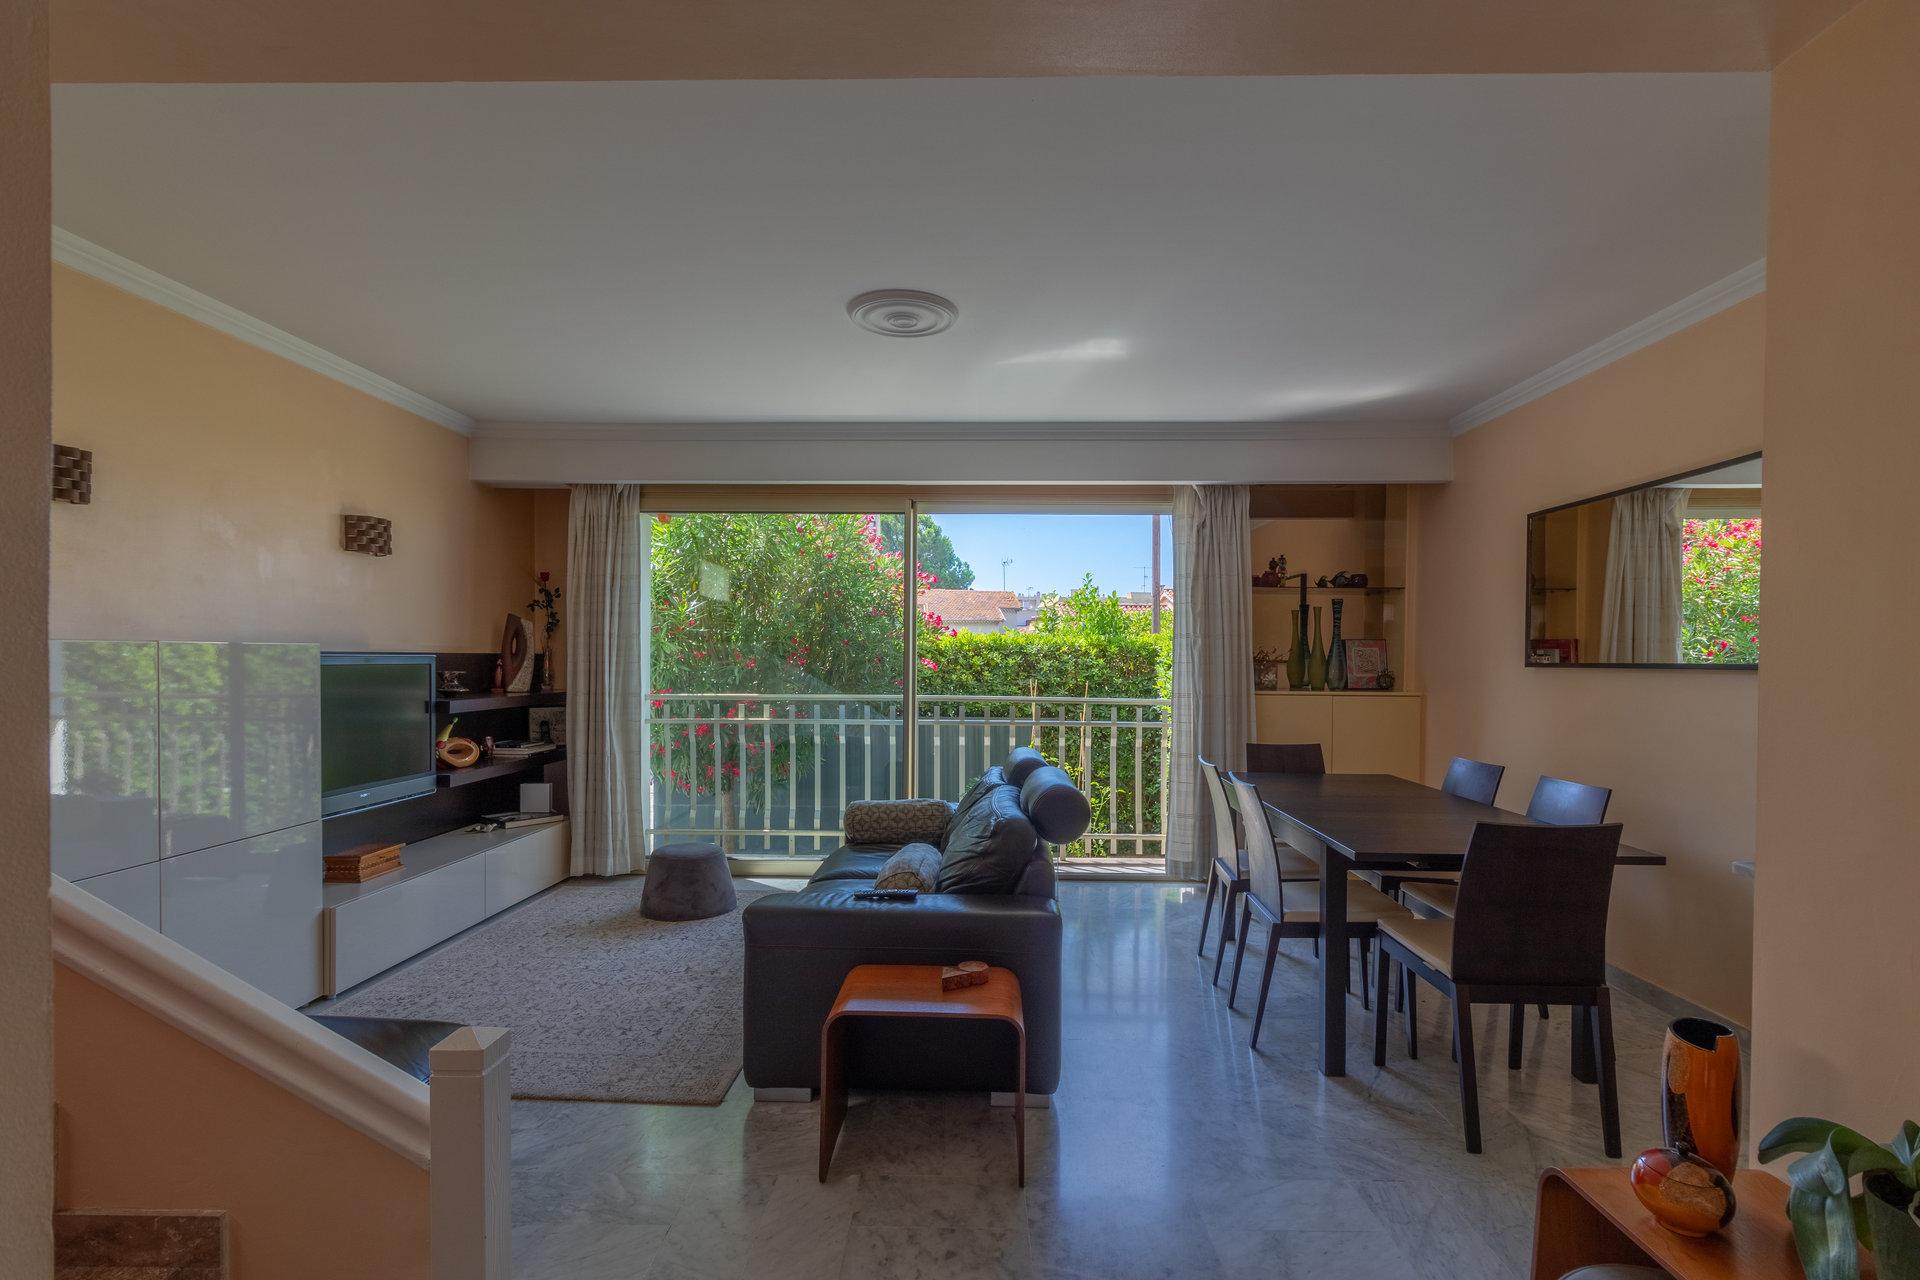 Duplex 4 pièces - Terrasse Jardin - Nice-Ouest chemin des Avelines